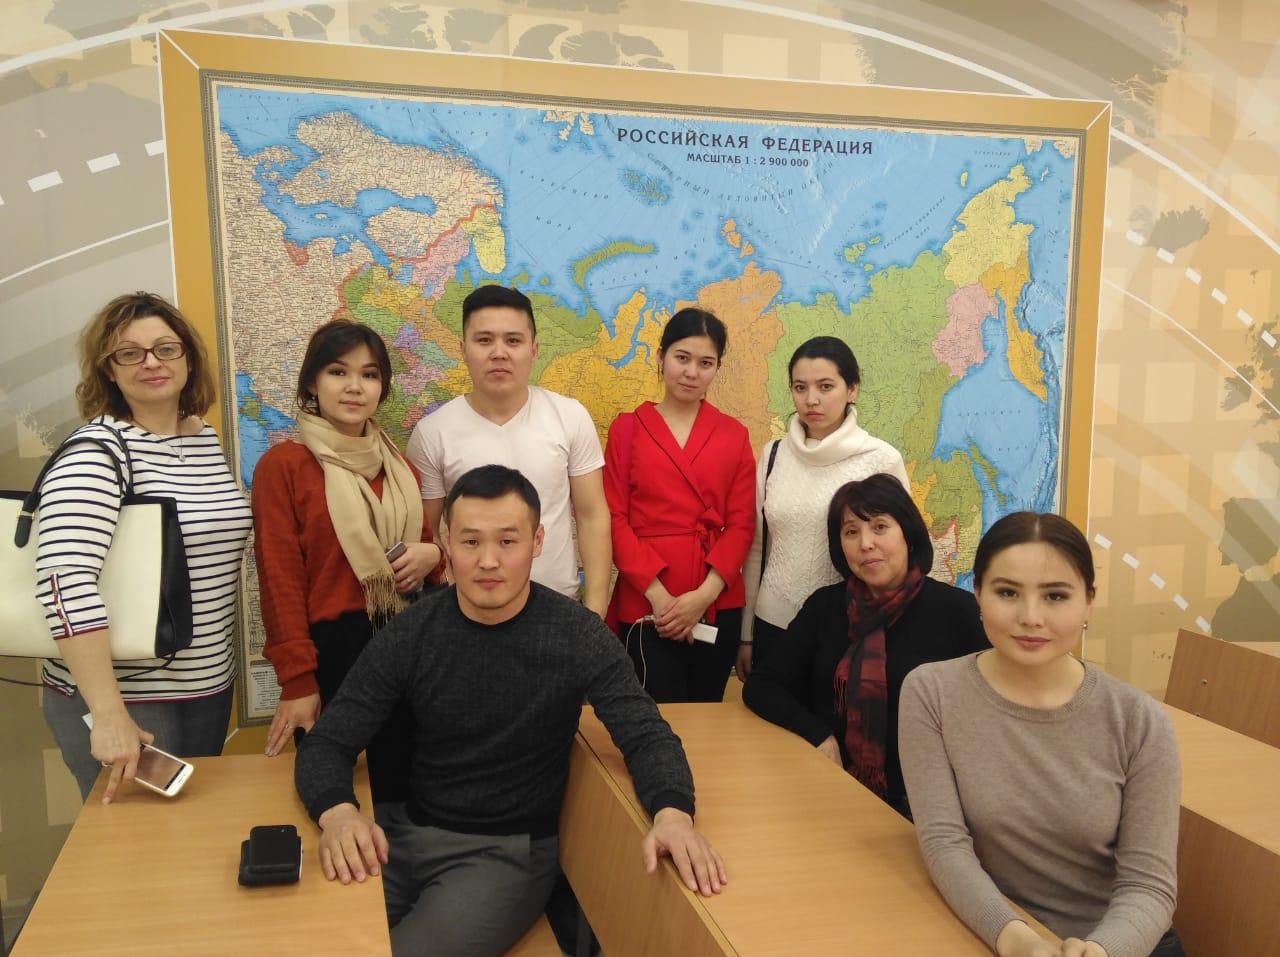 Магистранты КазНПУ посетили Московскую старшую школу